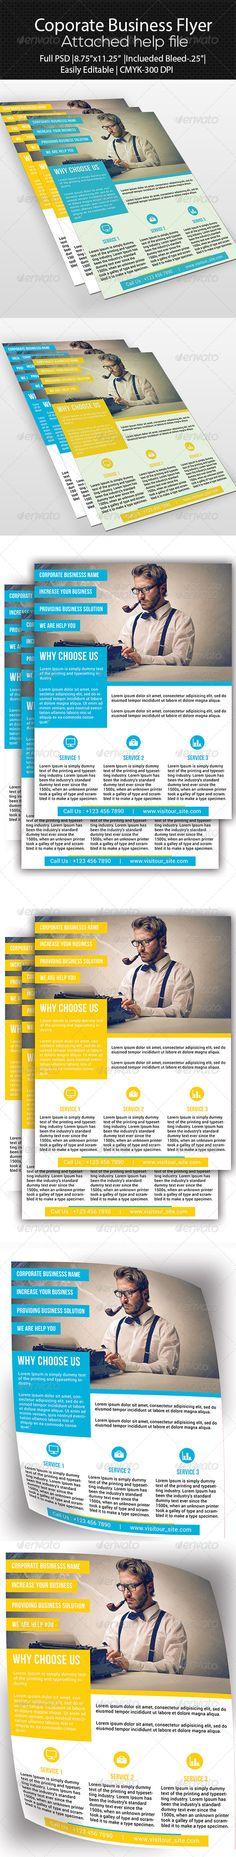 Corporate Business Flyer by SelenaParker.deviantart.com on @deviantART